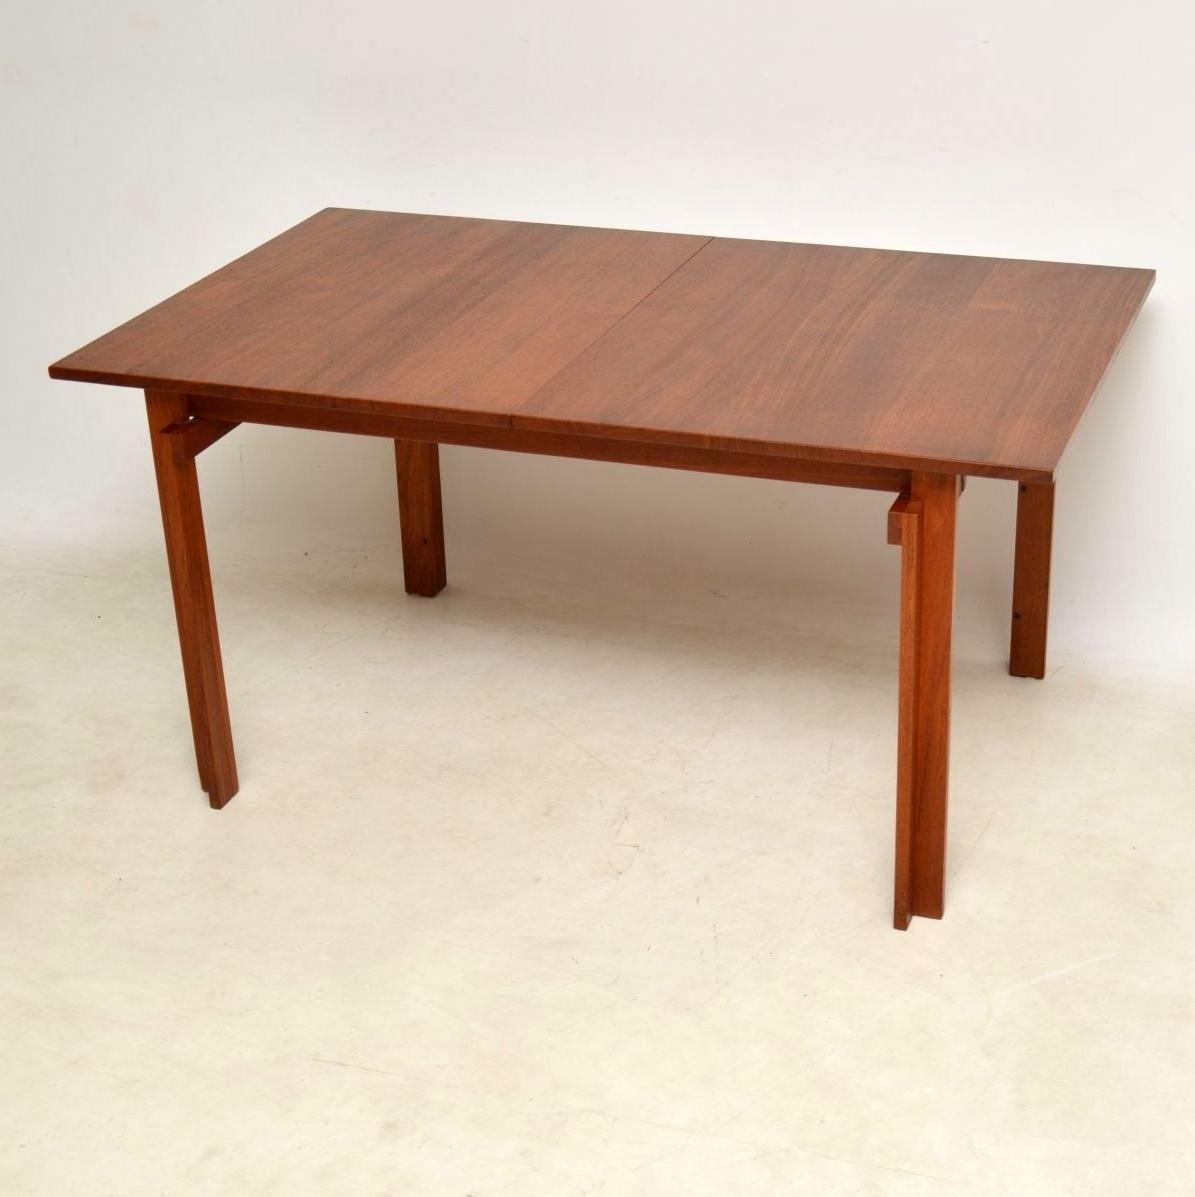 Preferred 1960's Vintage Danish Teak Dining Tableinger Klingenberg For Pertaining To Danish Dining Tables (View 18 of 25)